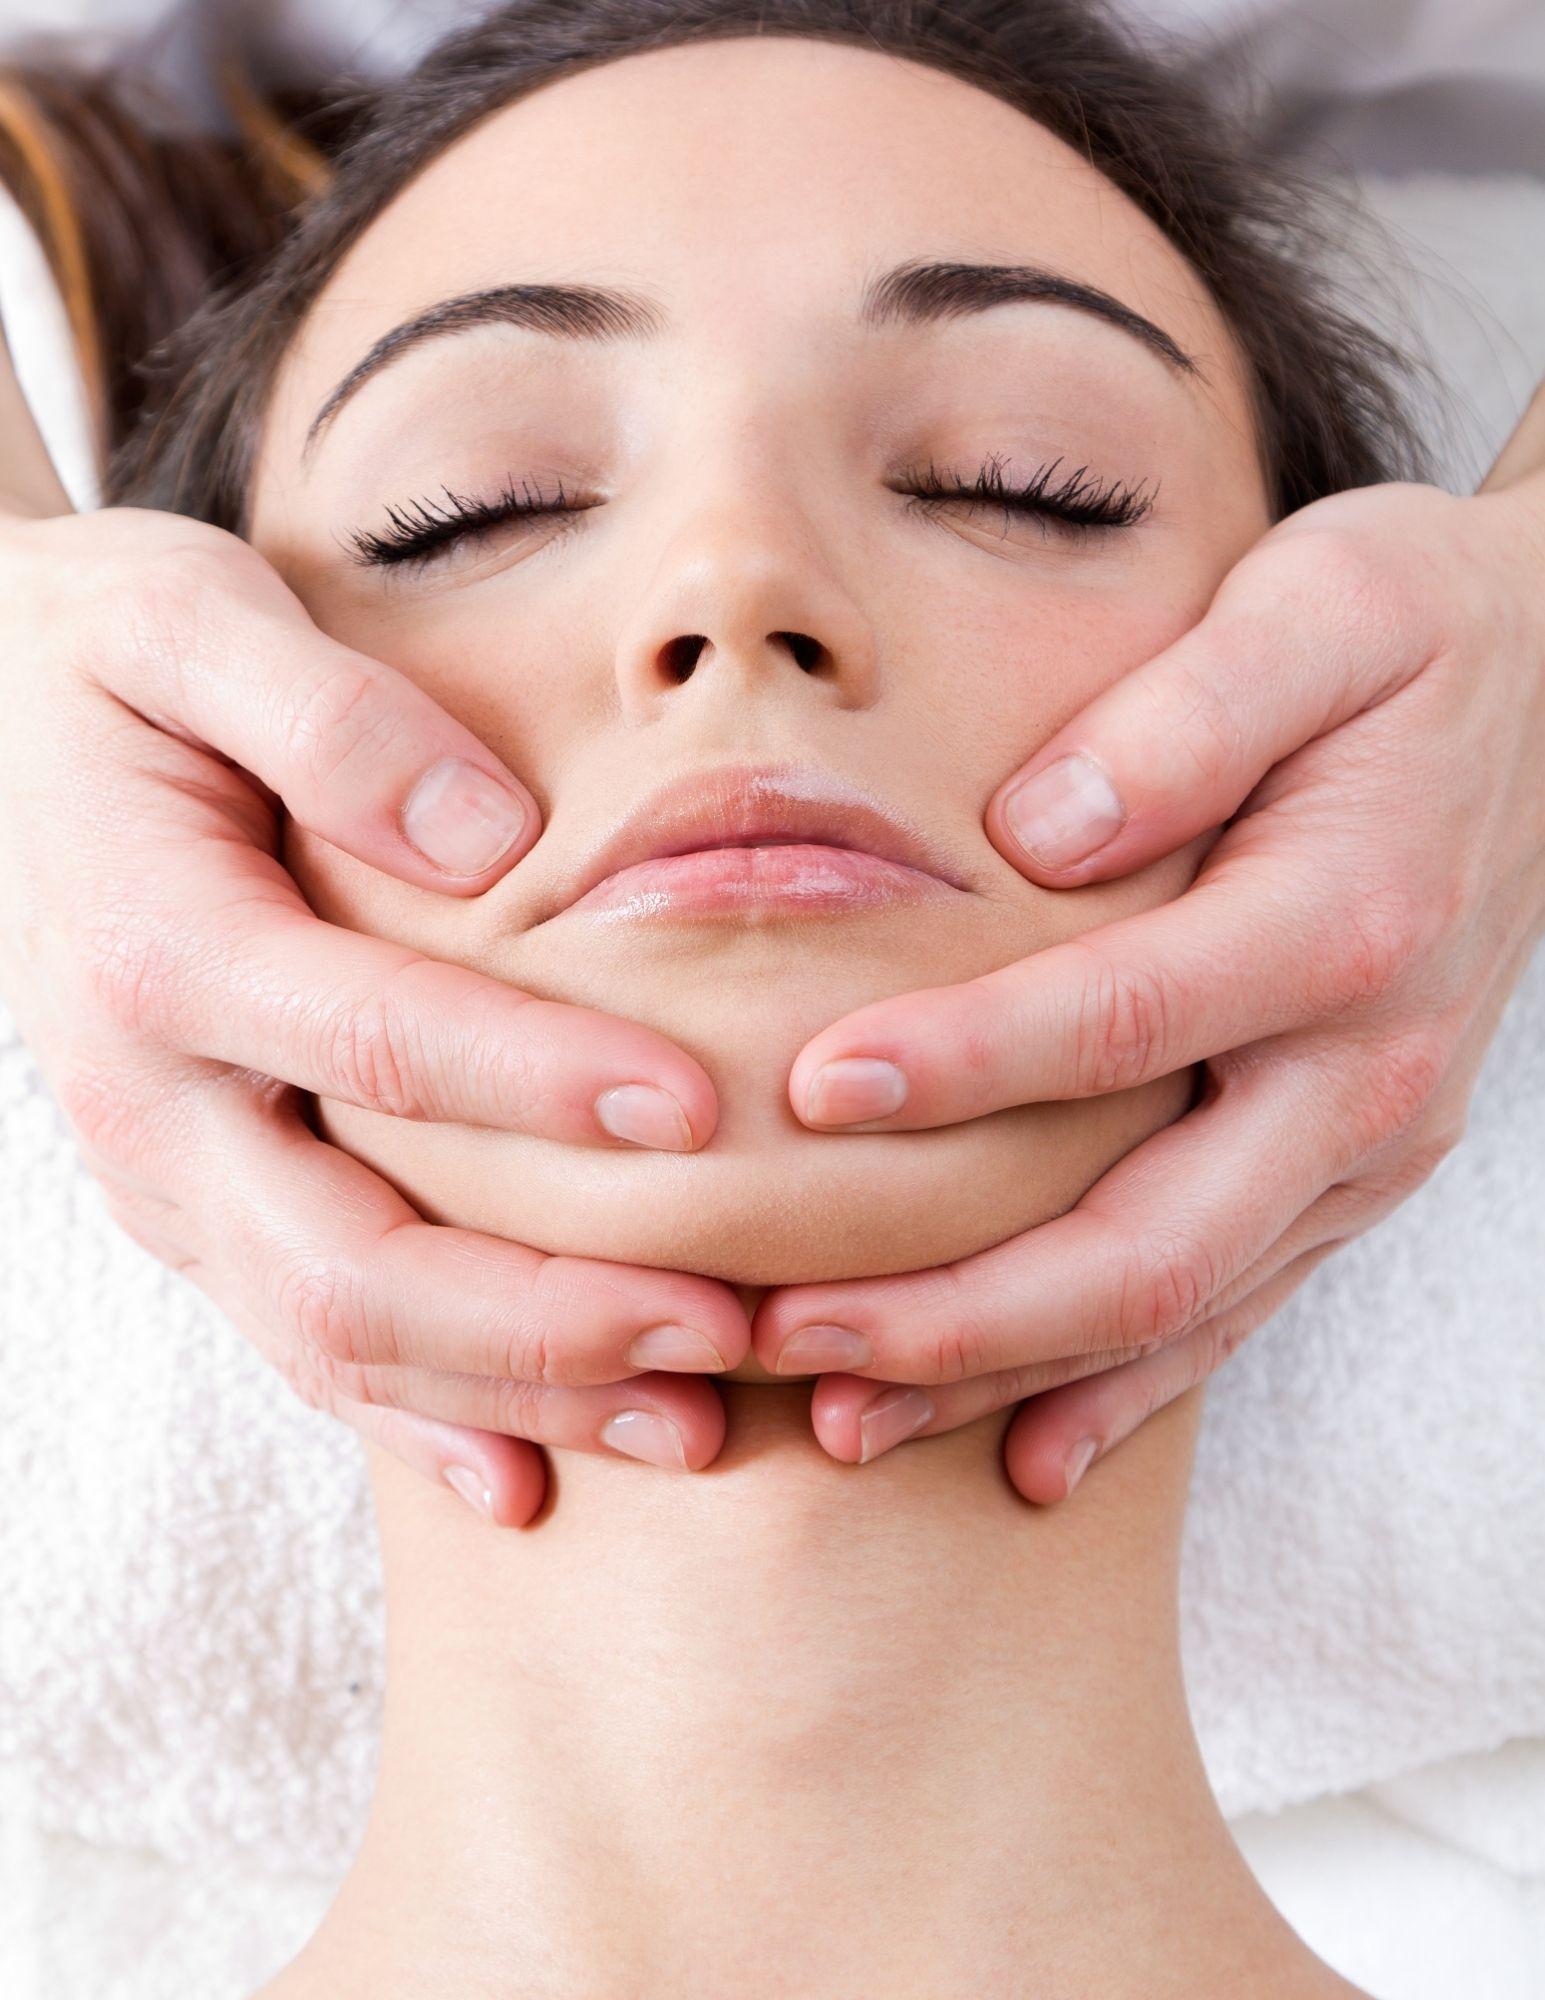 massage reduces allergy symptoms